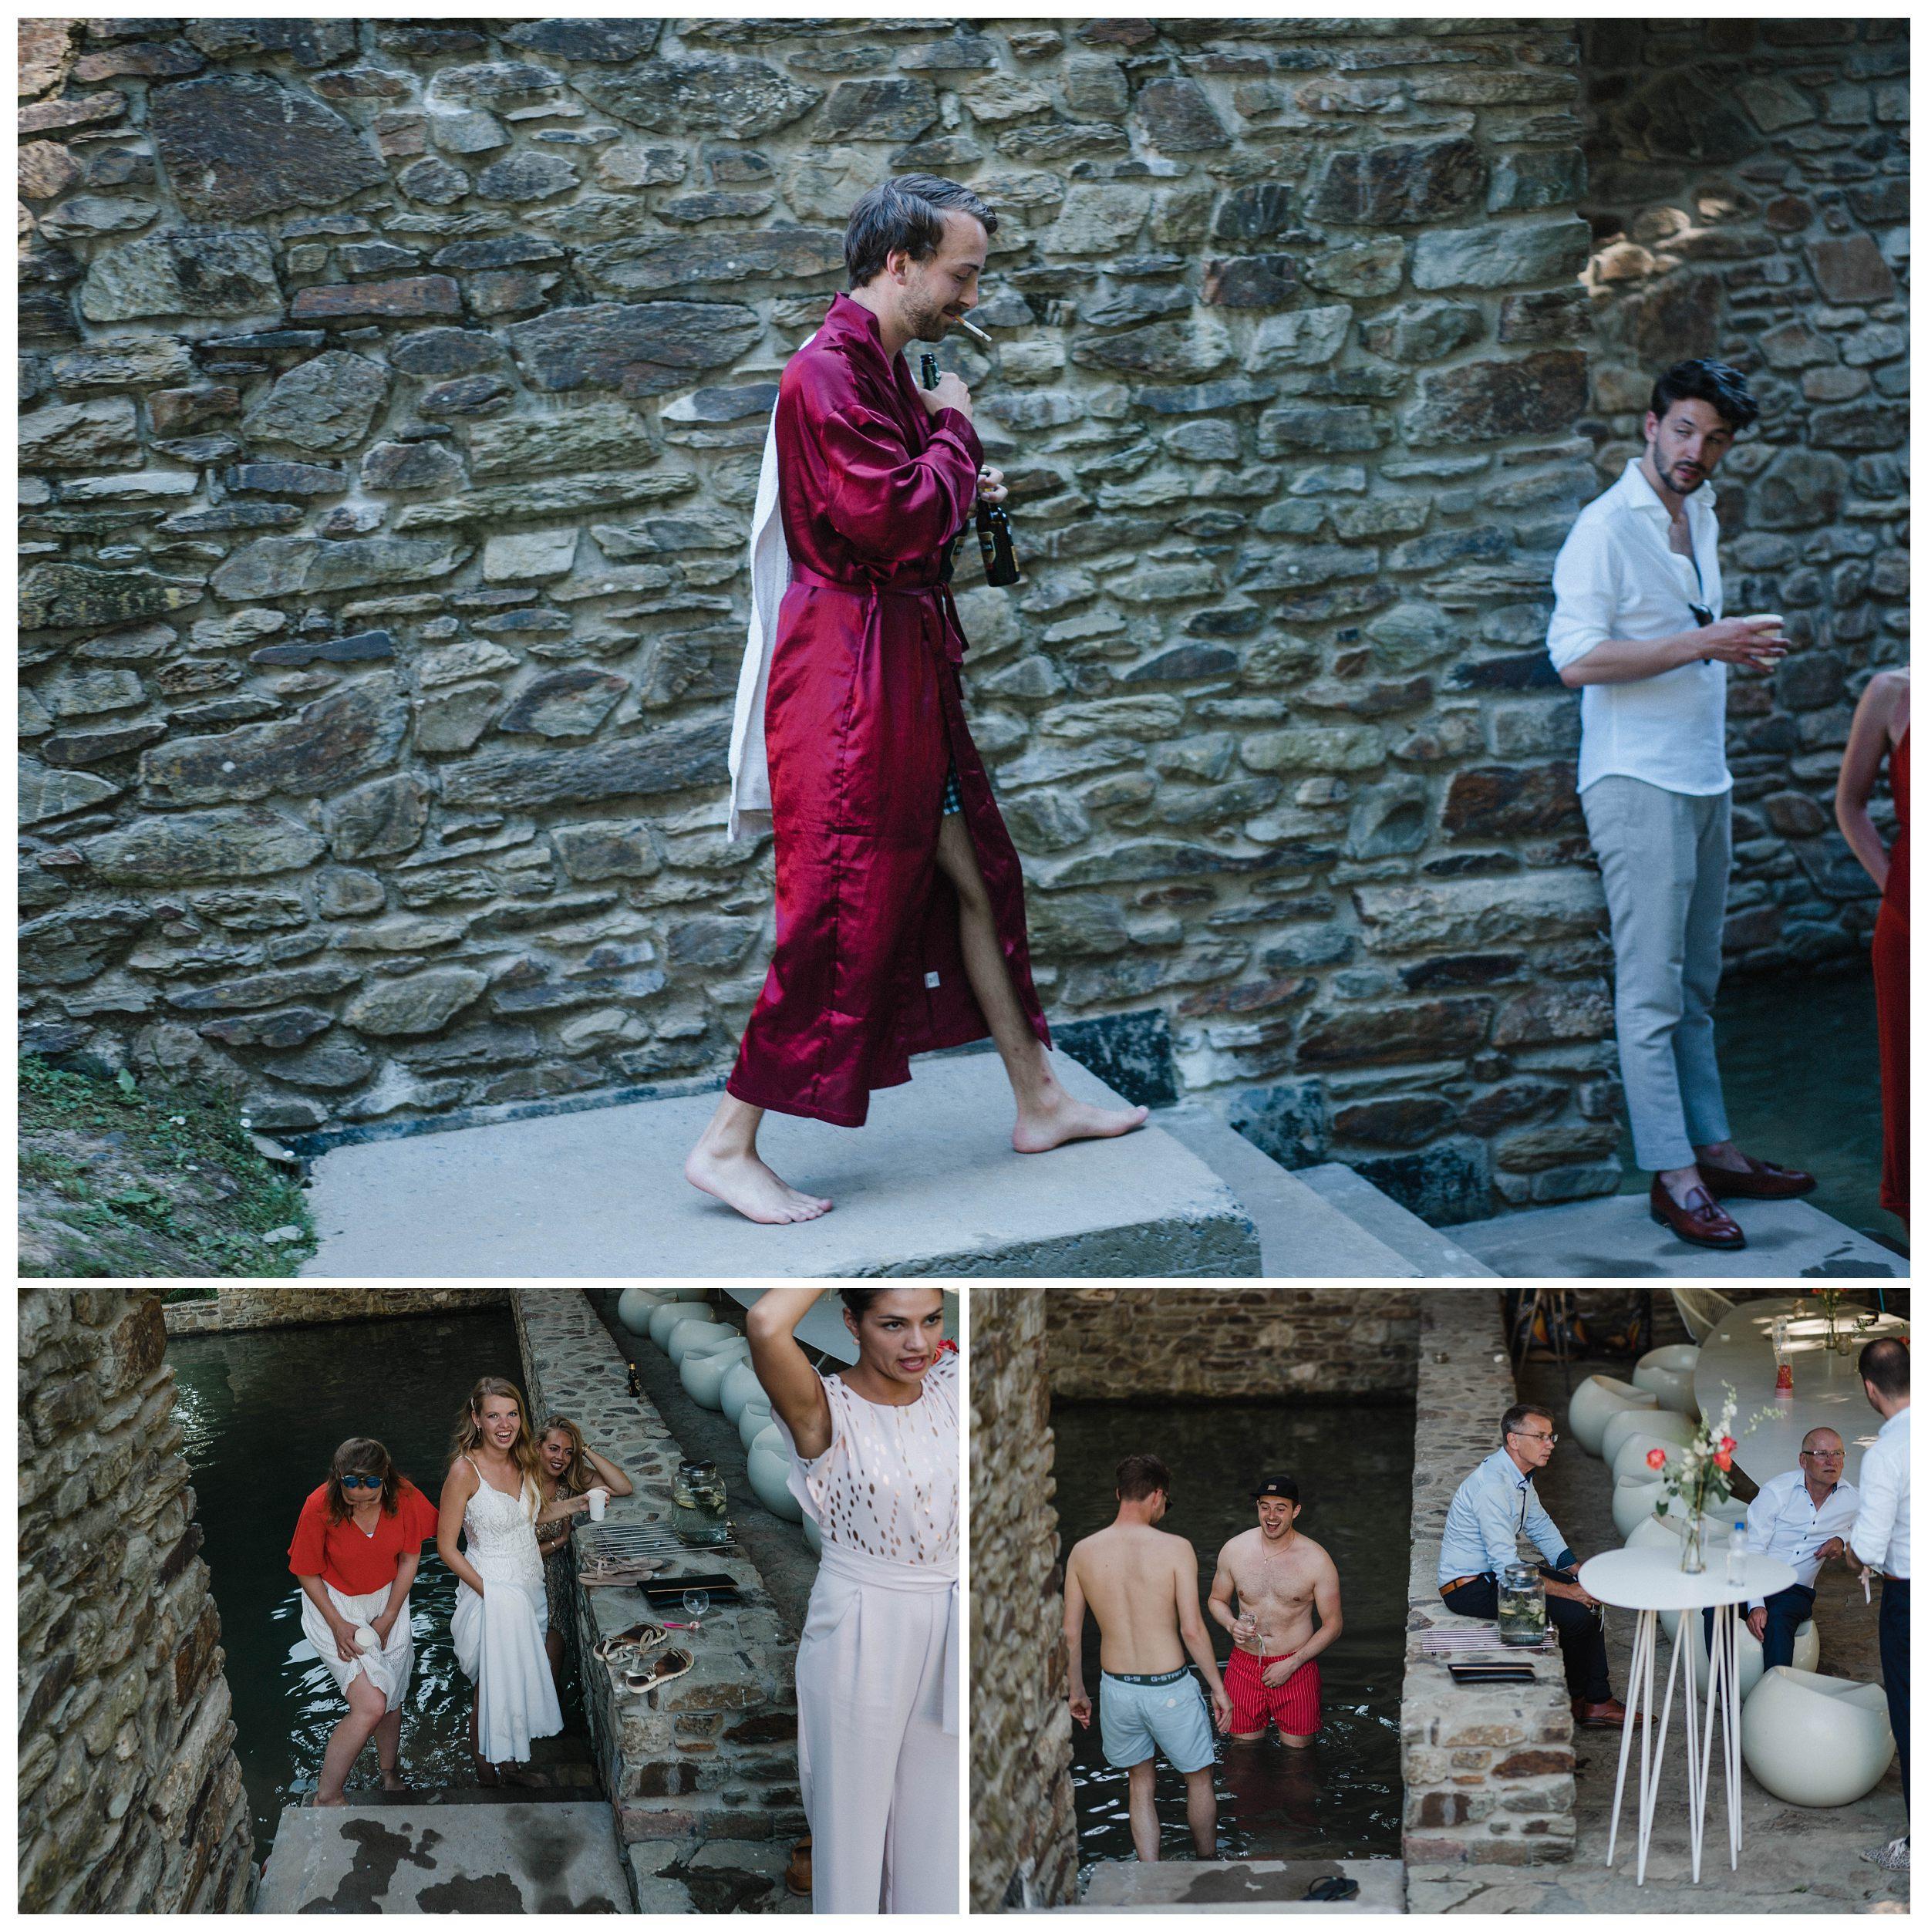 huwelijksfotograaf bruidsfotograaf destinationwedding huwelijksfotografie in ardennen nederland (75).jpg